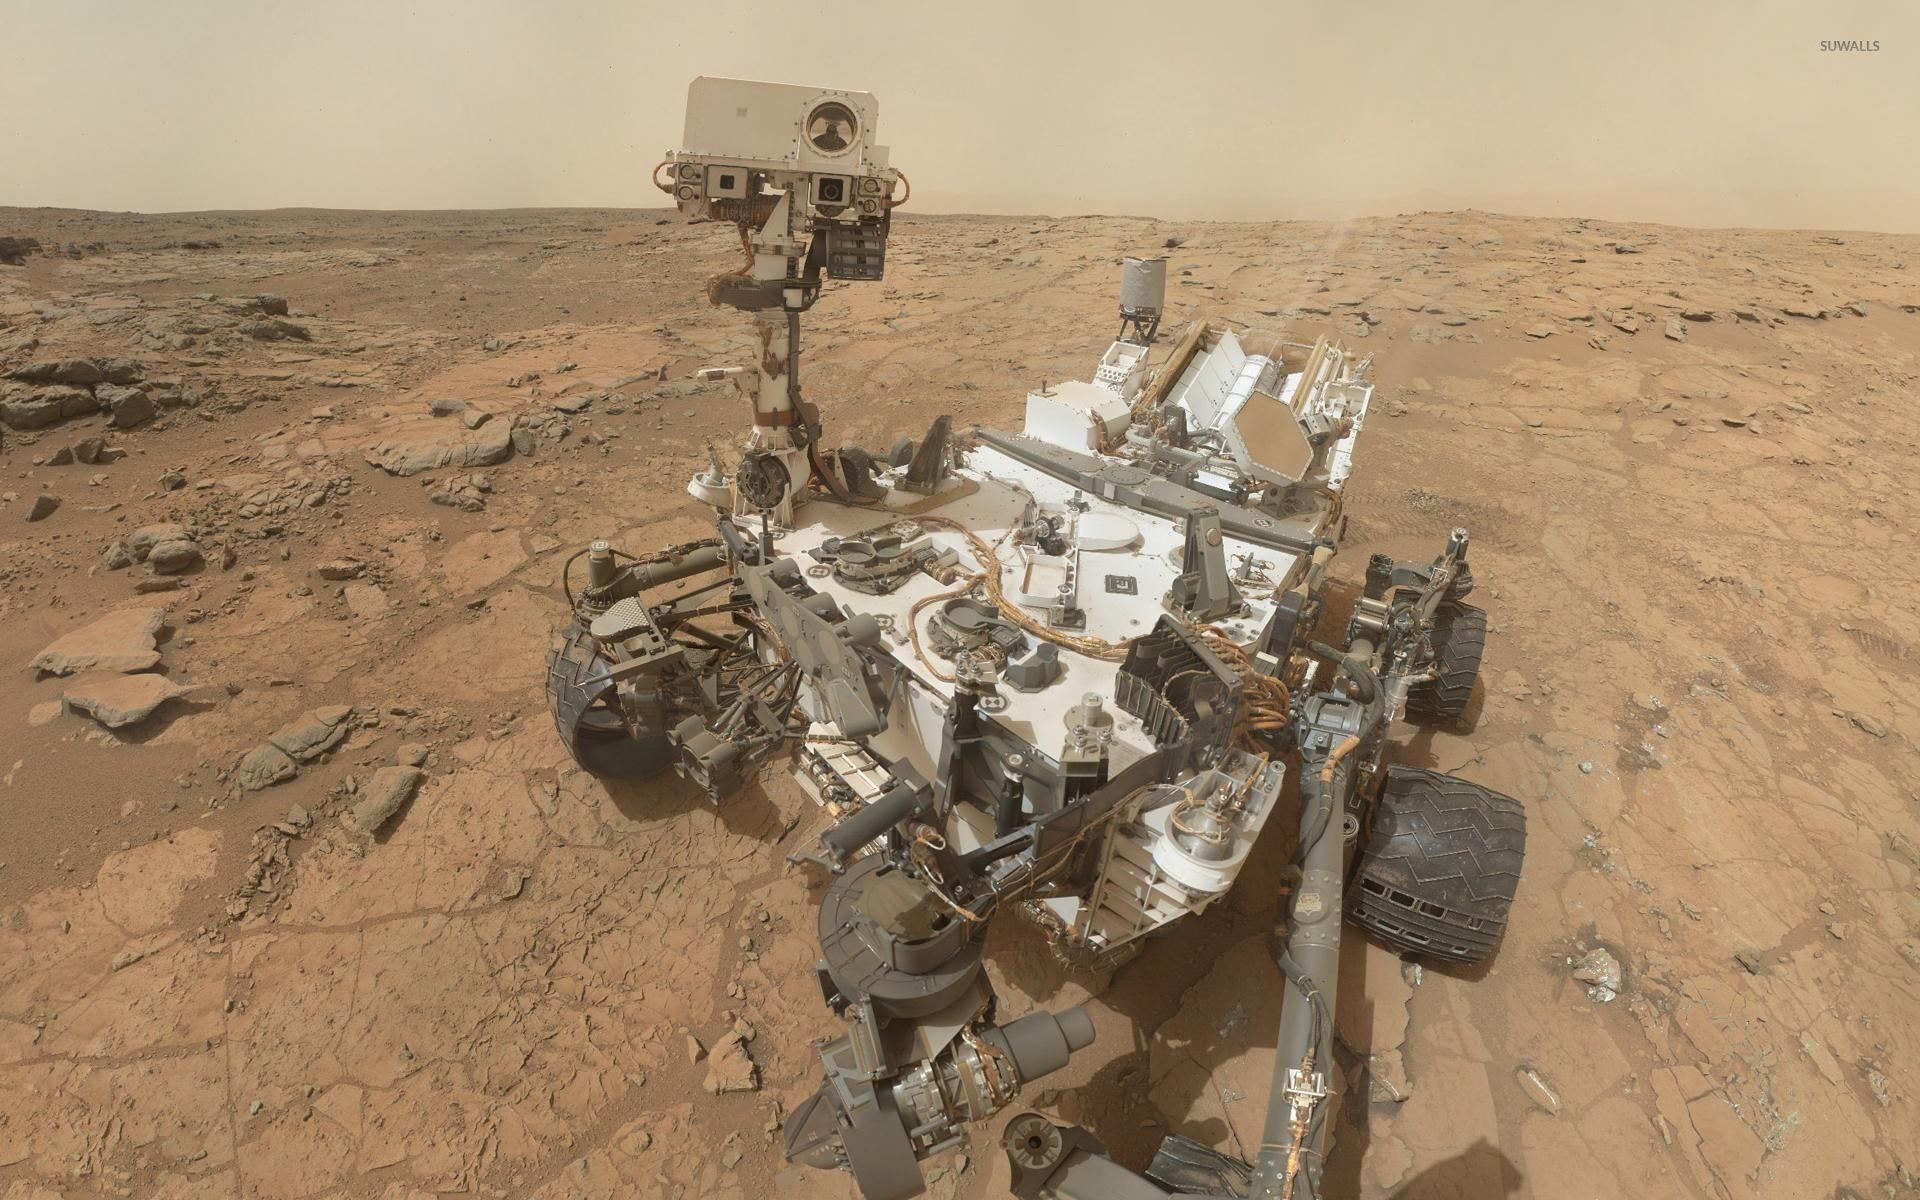 Res: 1920x1200, Curiosity on Mars wallpaper